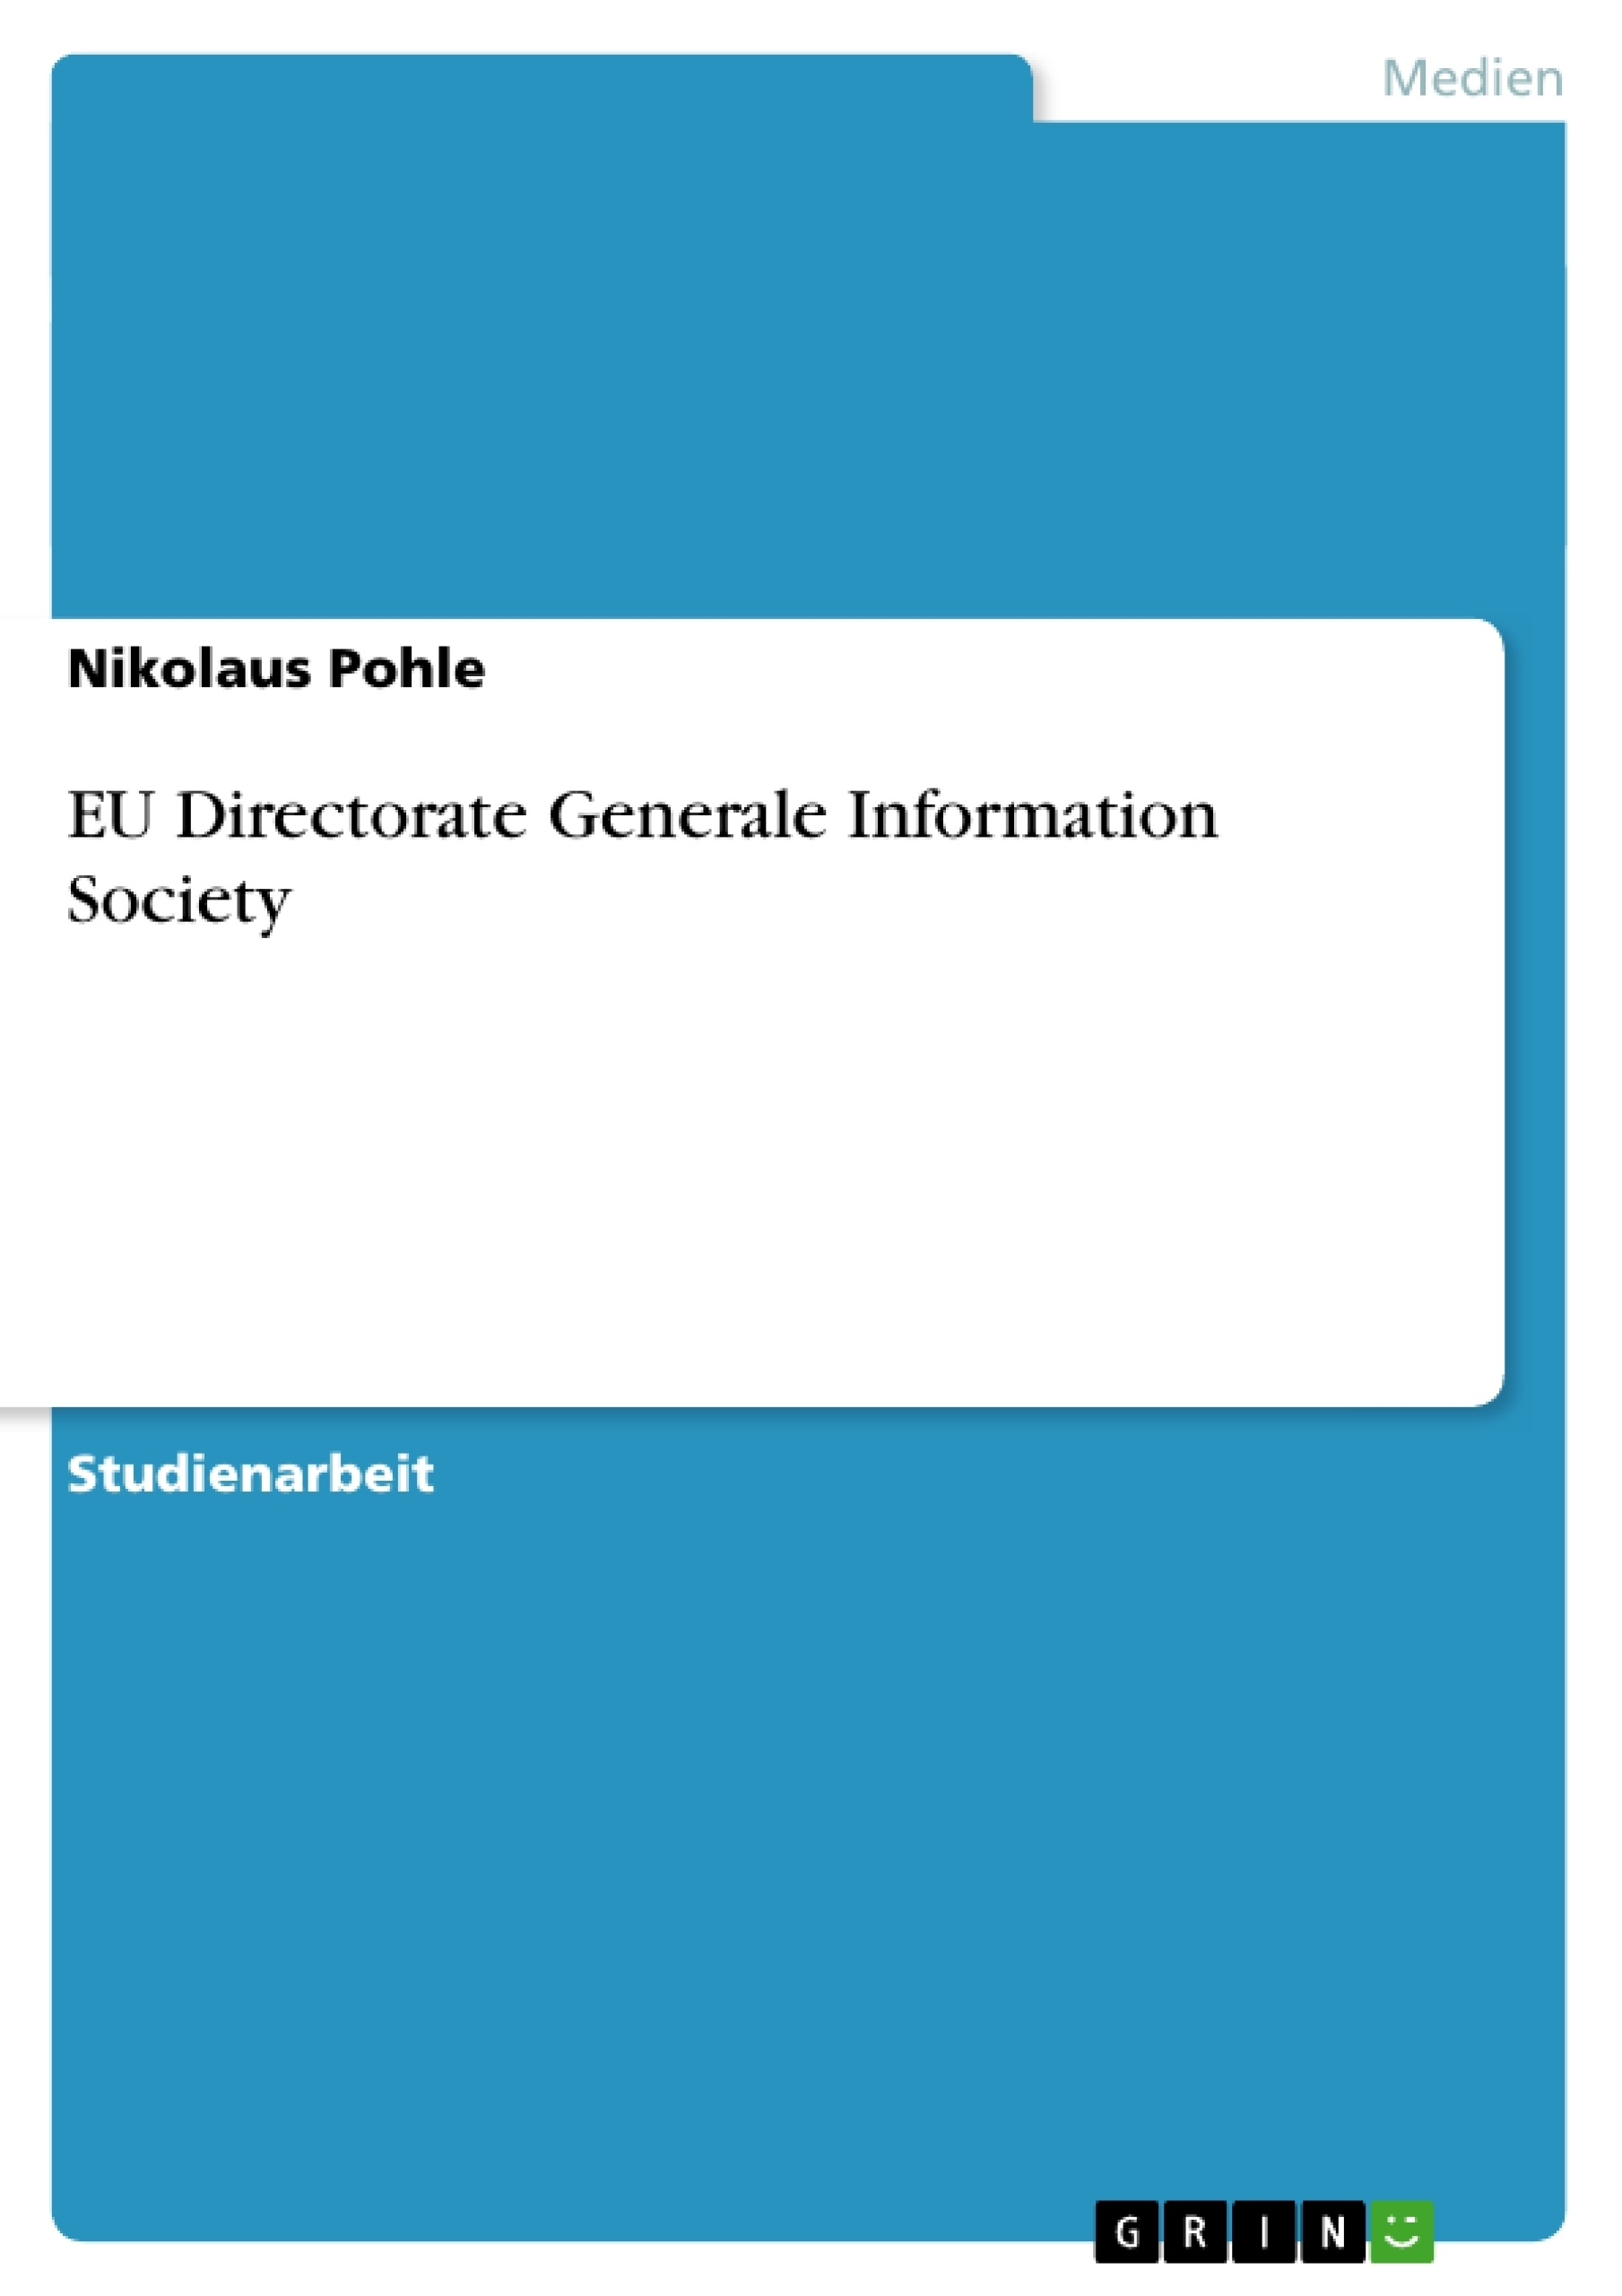 Titel: EU Directorate Generale Information Society